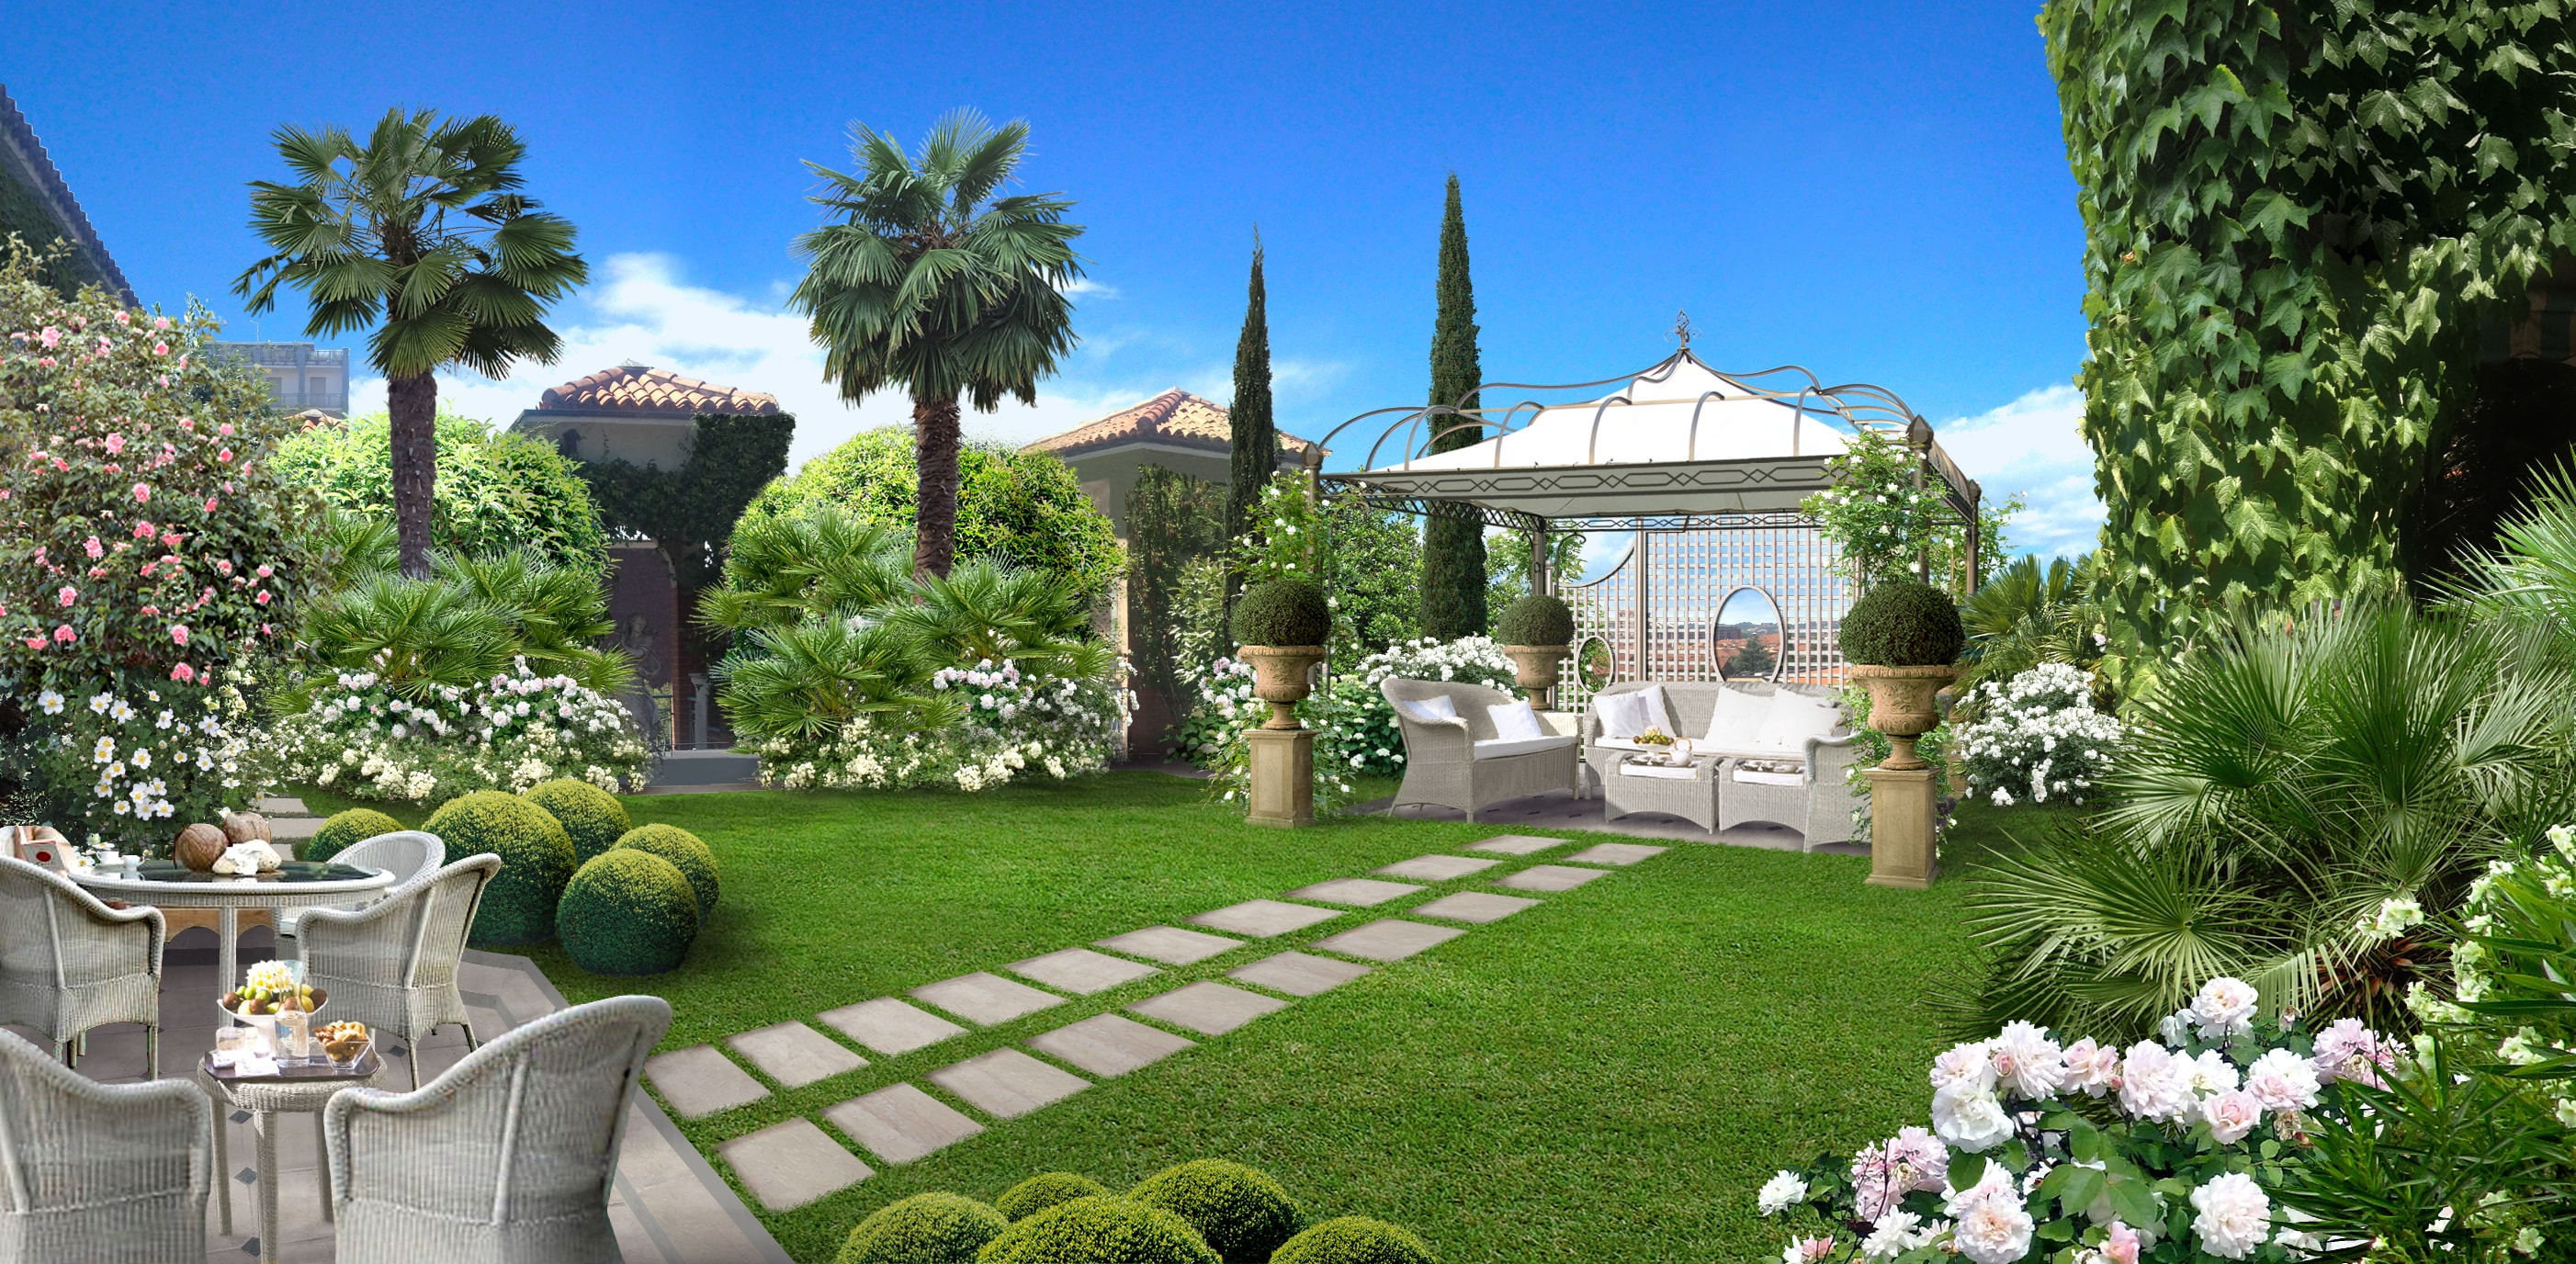 Casa moderna roma italy soluzioni giardino - Soluzioni giardino ...